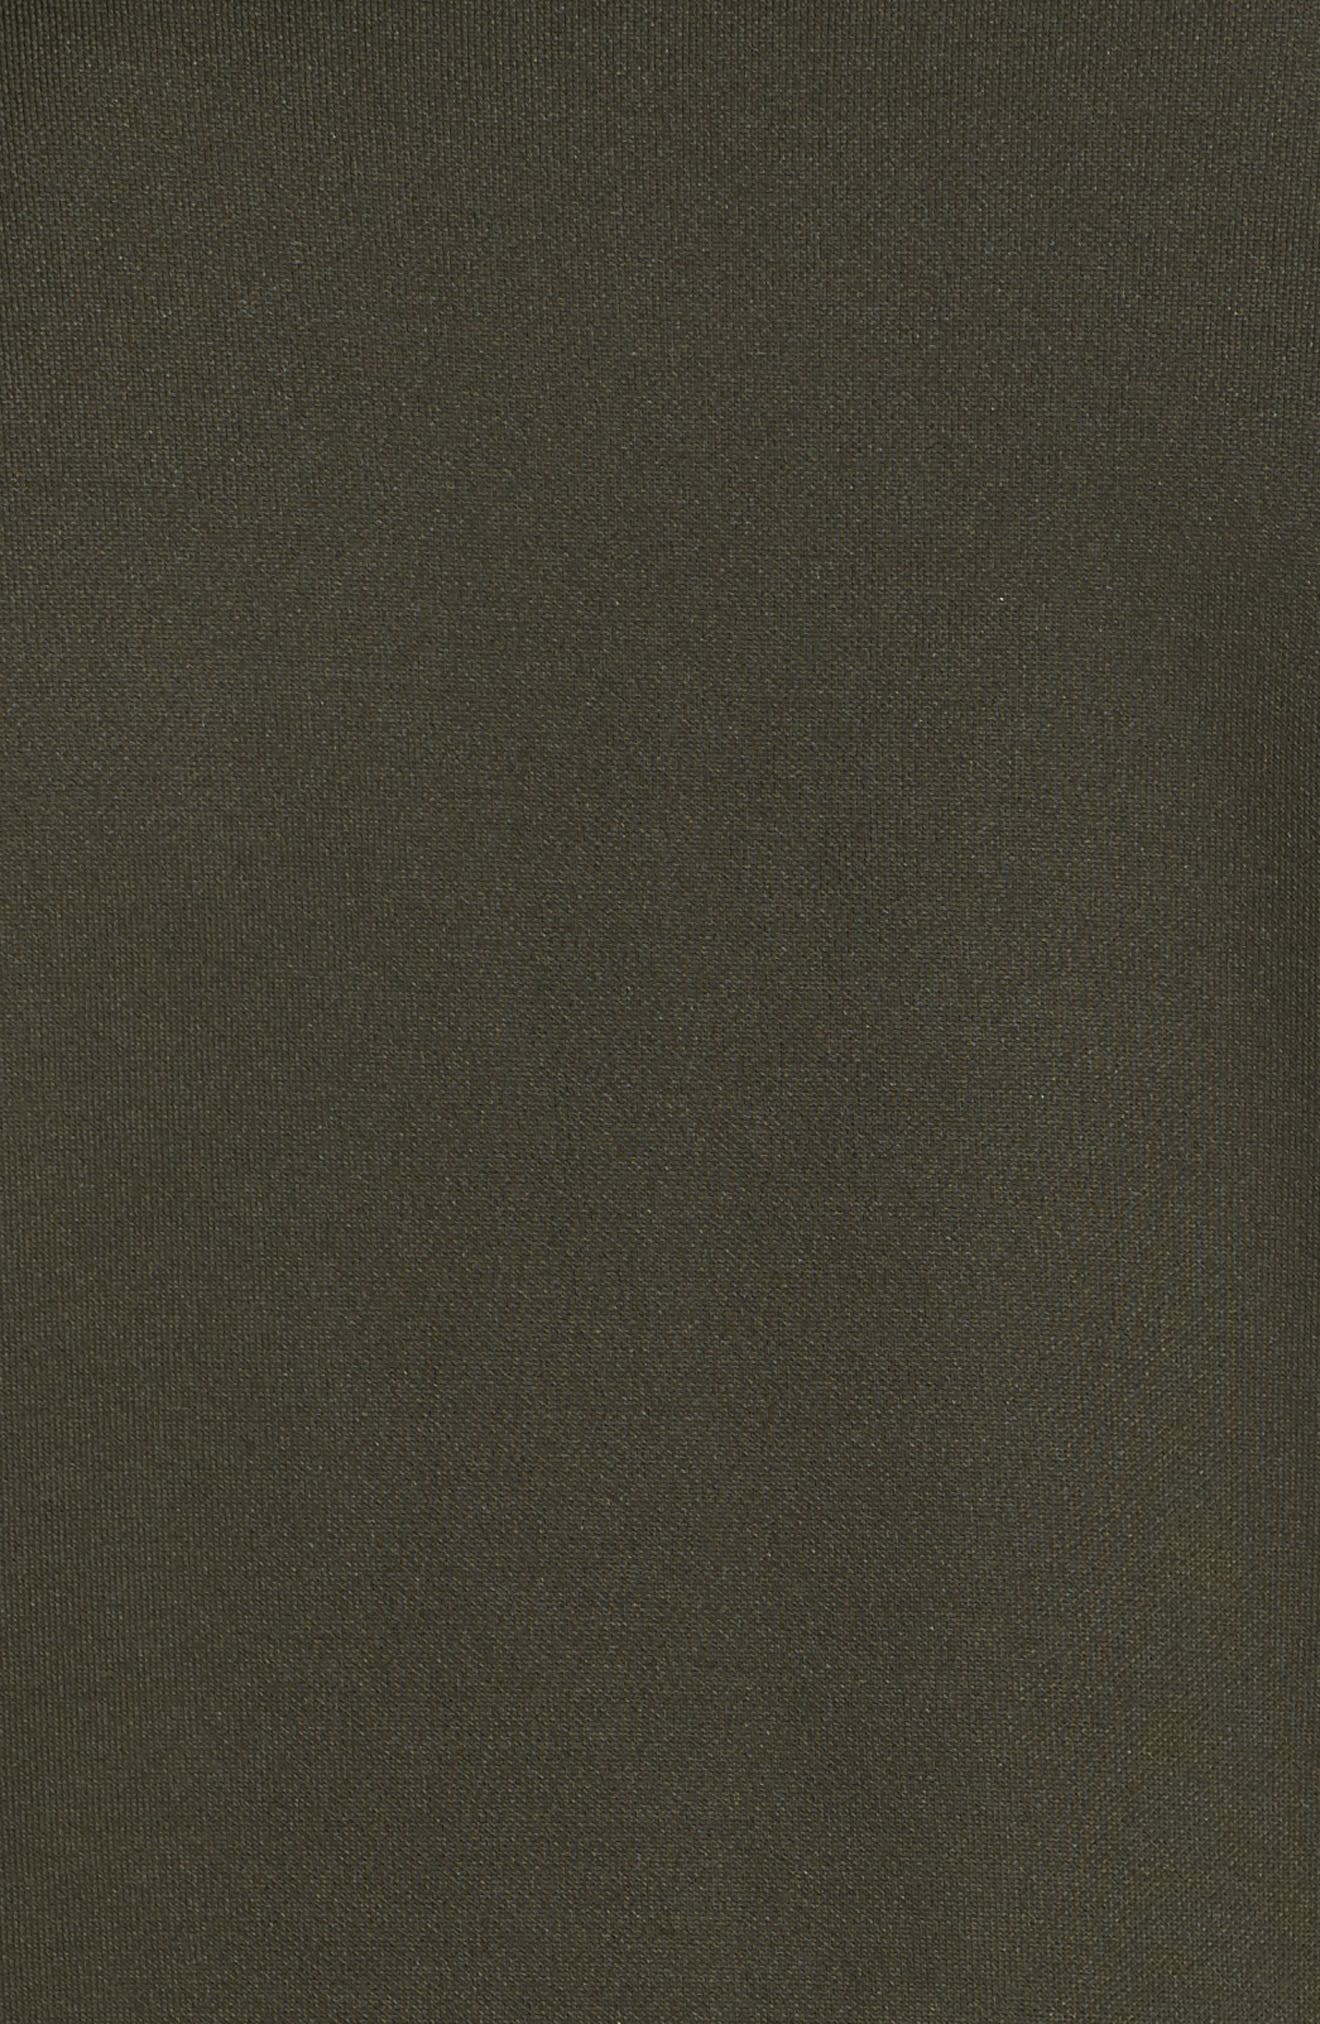 Sportswear Crop Jacket,                             Alternate thumbnail 6, color,                             Sequoia/ Sail